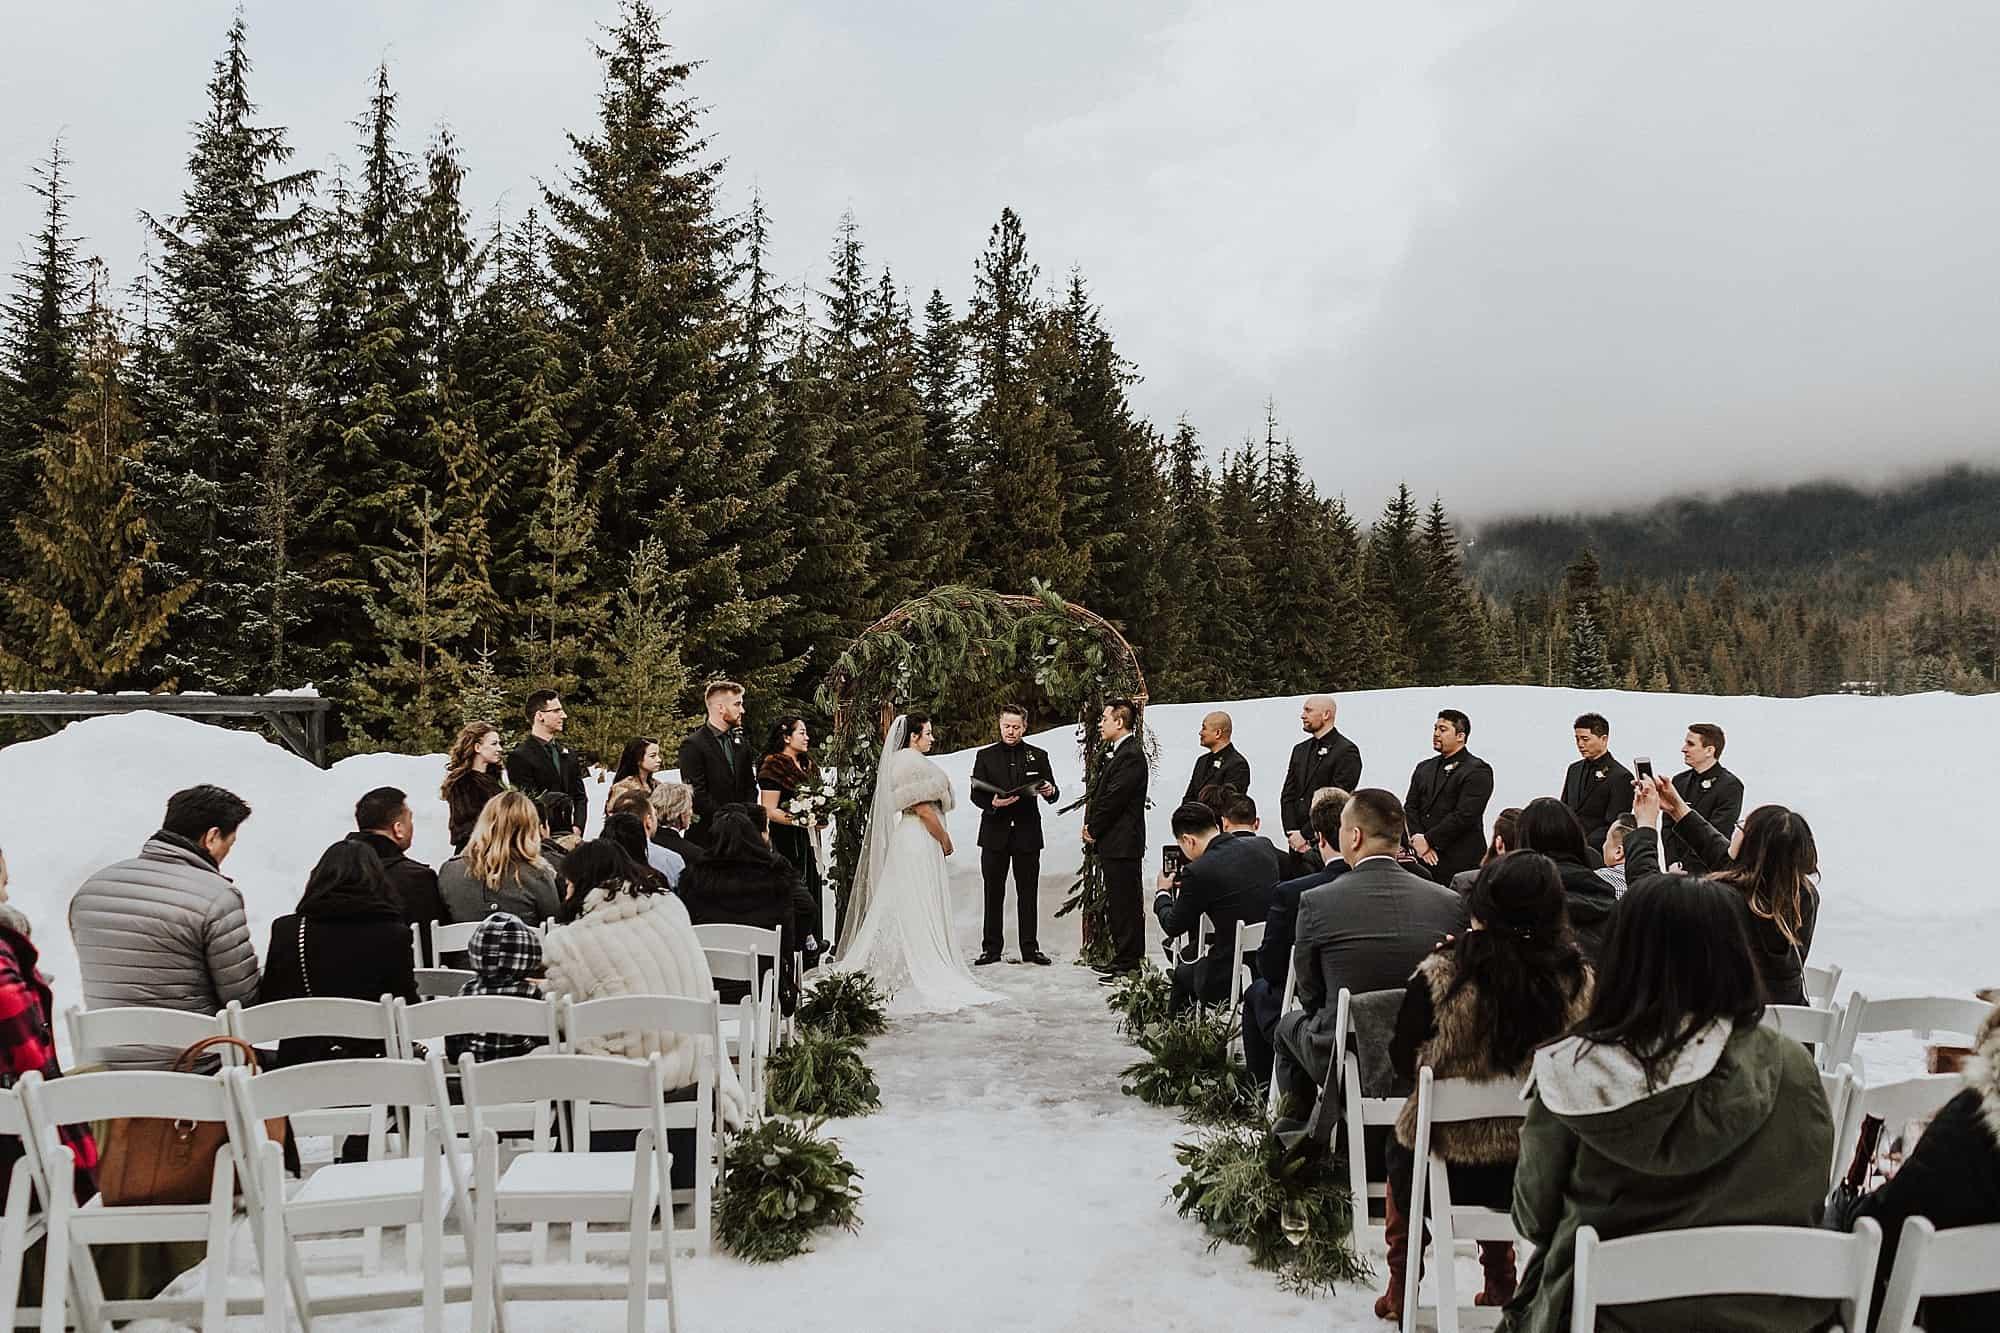 fairmont chateau whistler chalet ceremony location